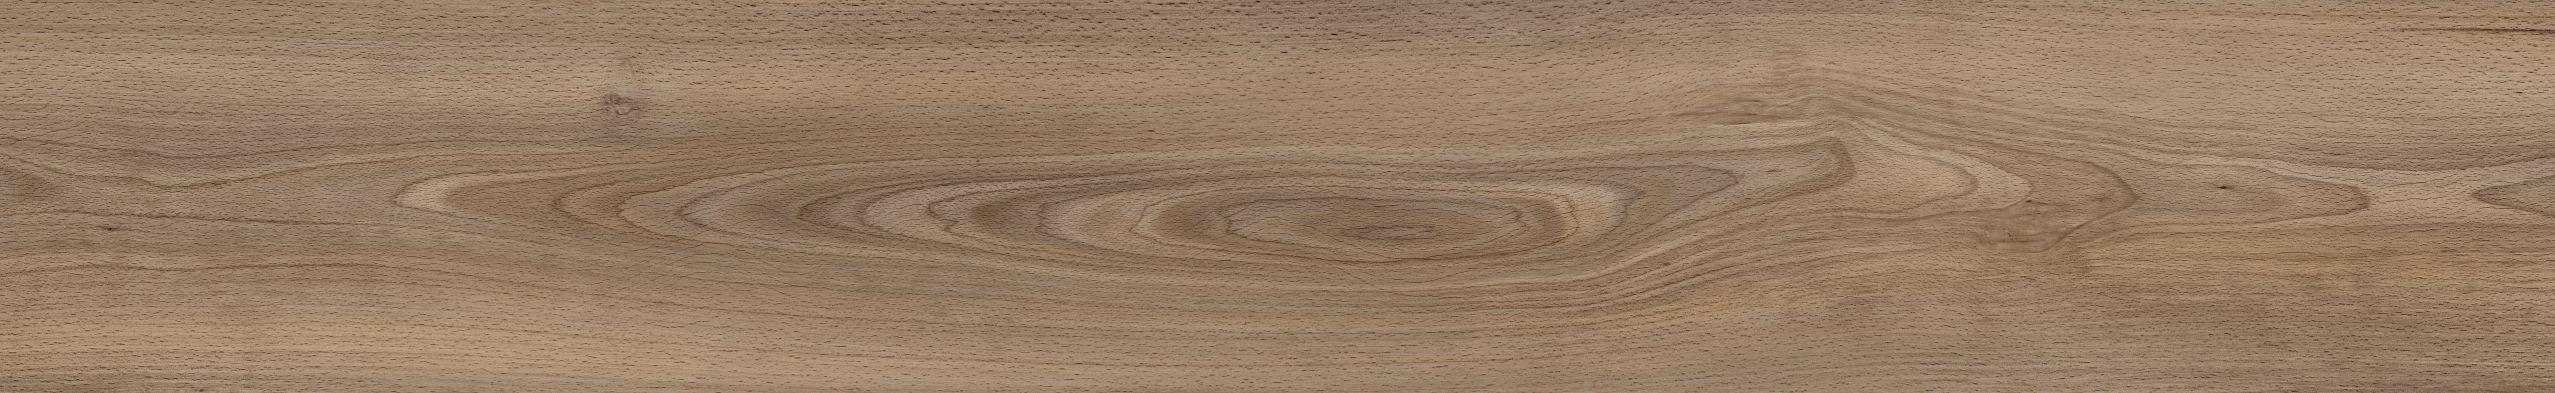 Panele winylowe LVT modulari ® WOOD DRYBACK 19,6 x 132 cm 28288